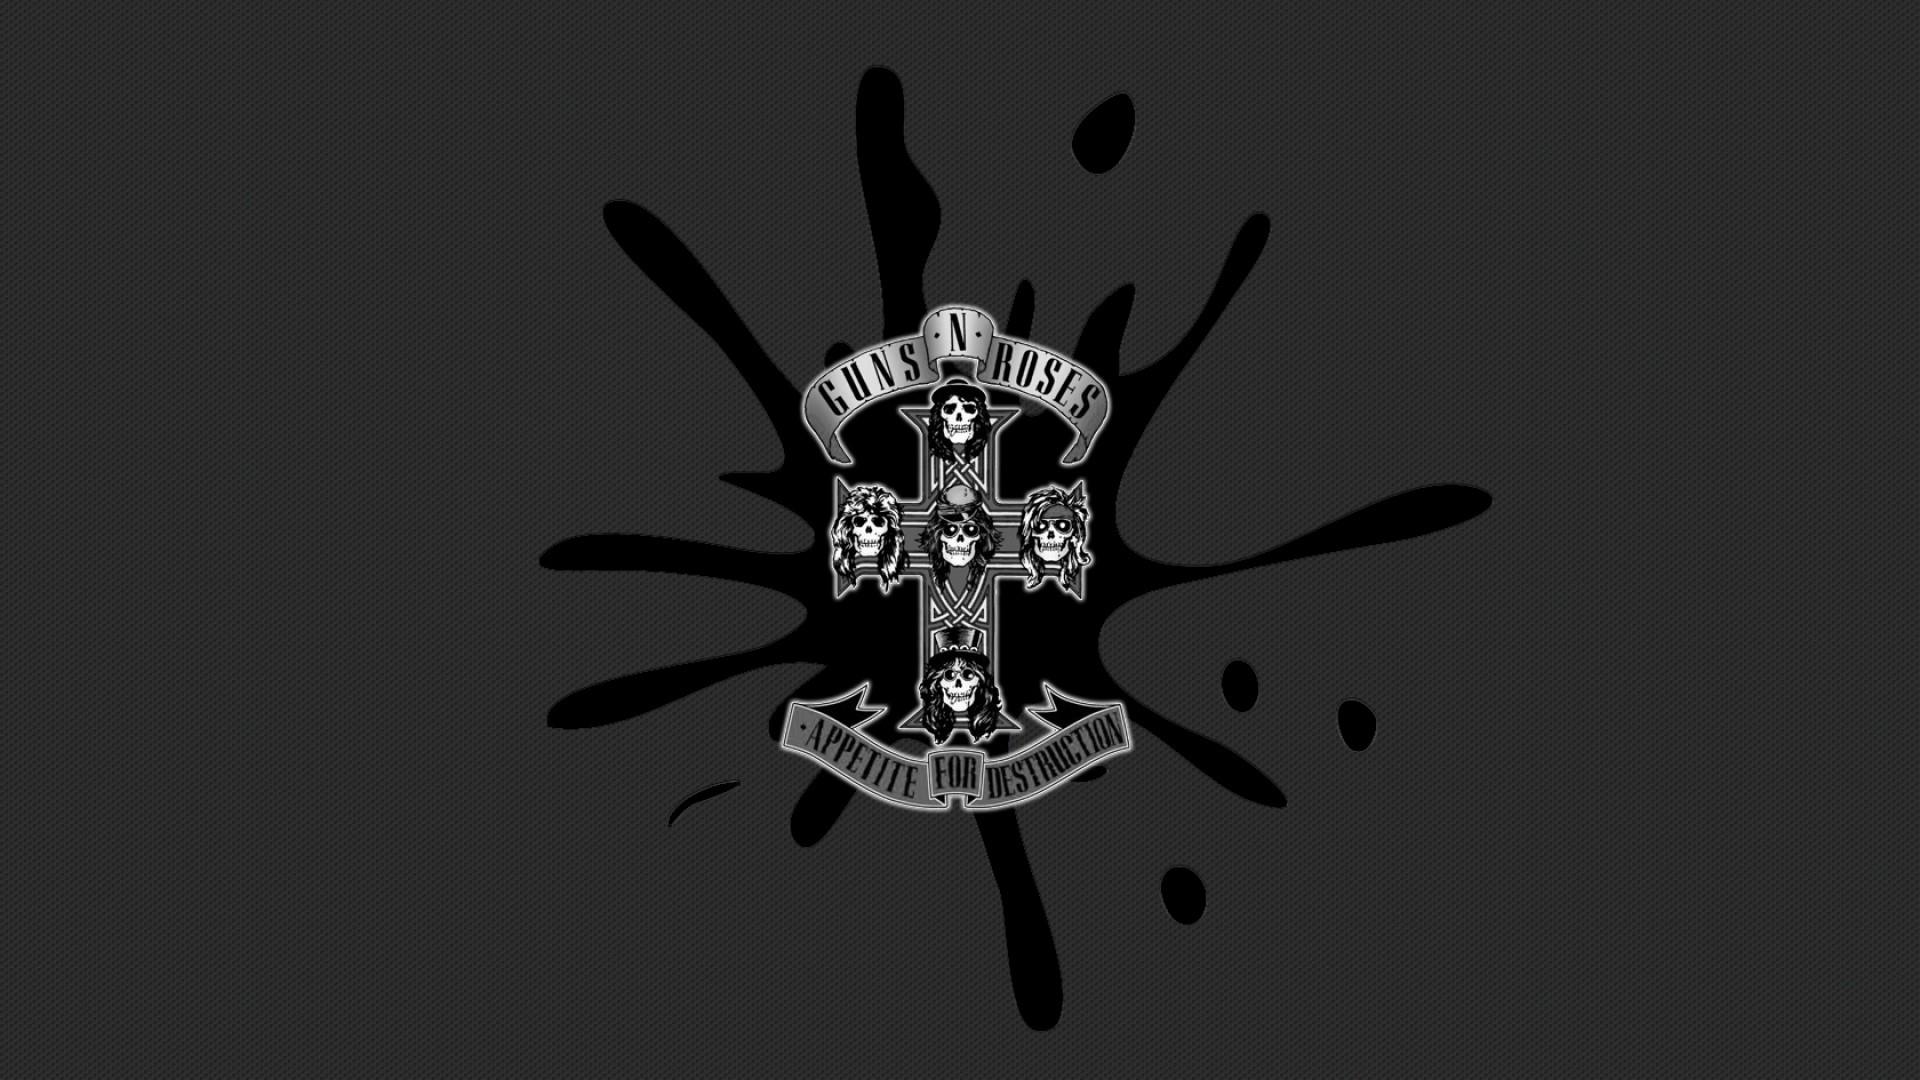 Preview wallpaper guns n roses, spot, cross, darkness, skulls 1920×1080